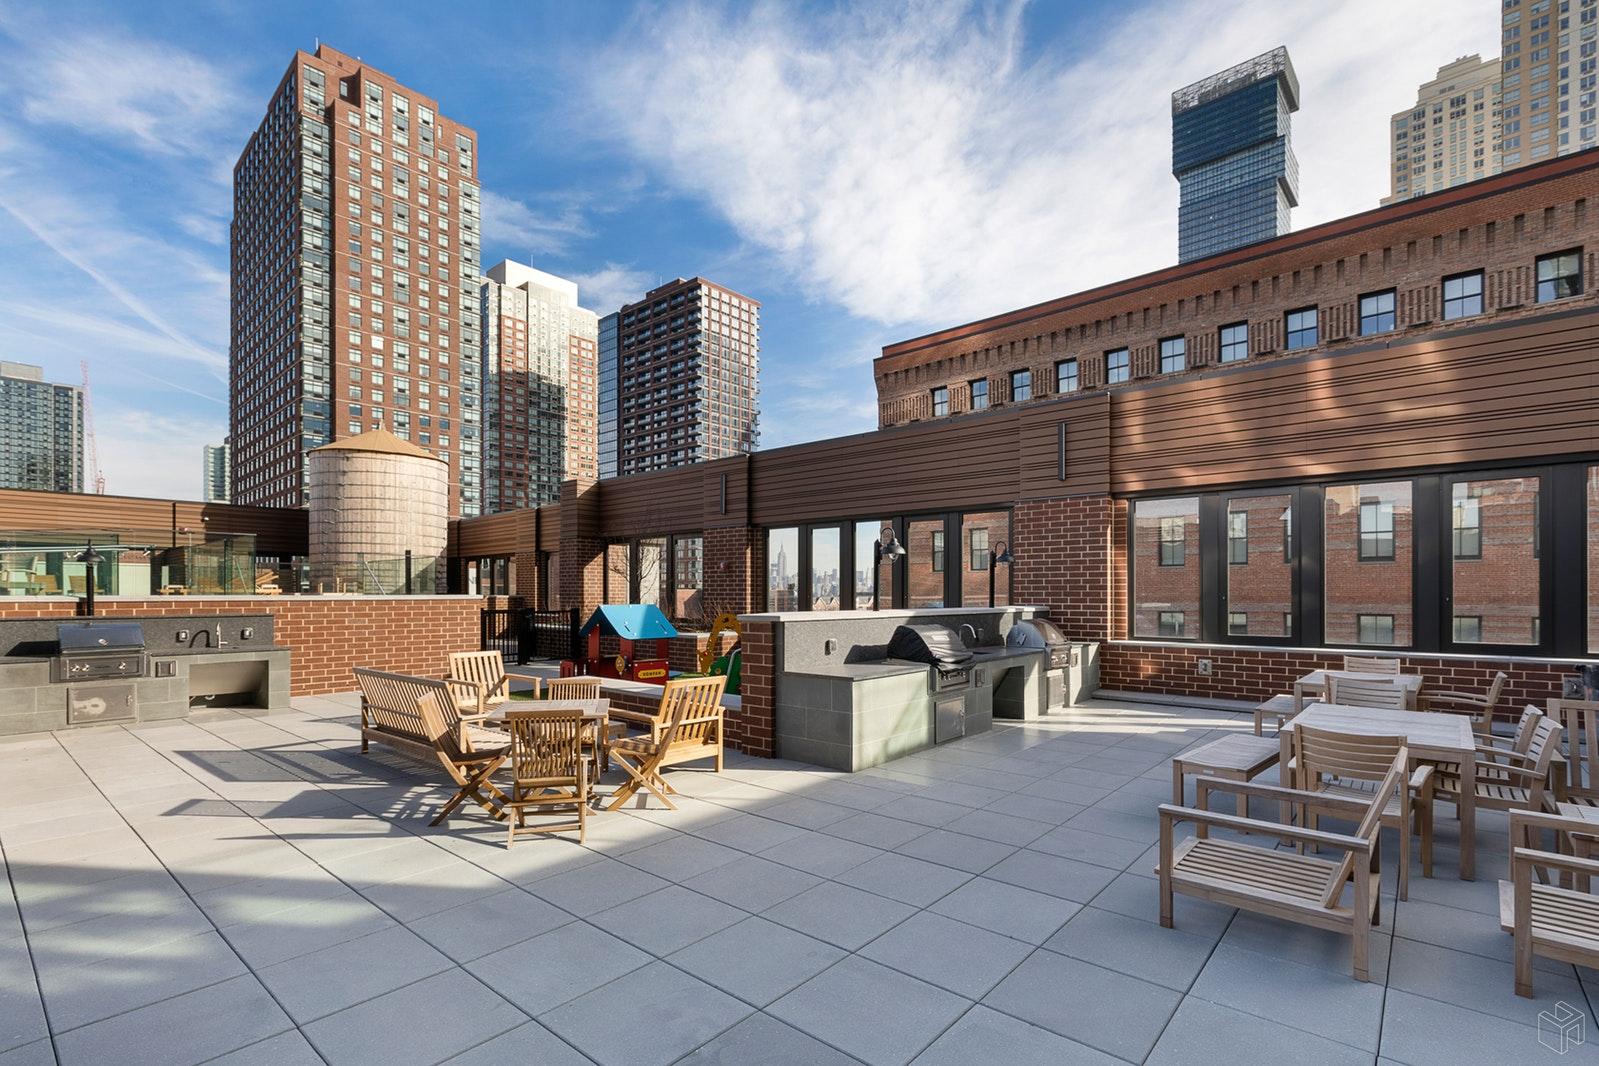 10 PROVOST STREET 2502, Jersey City Downtown, $809,000, Web #: 19504824